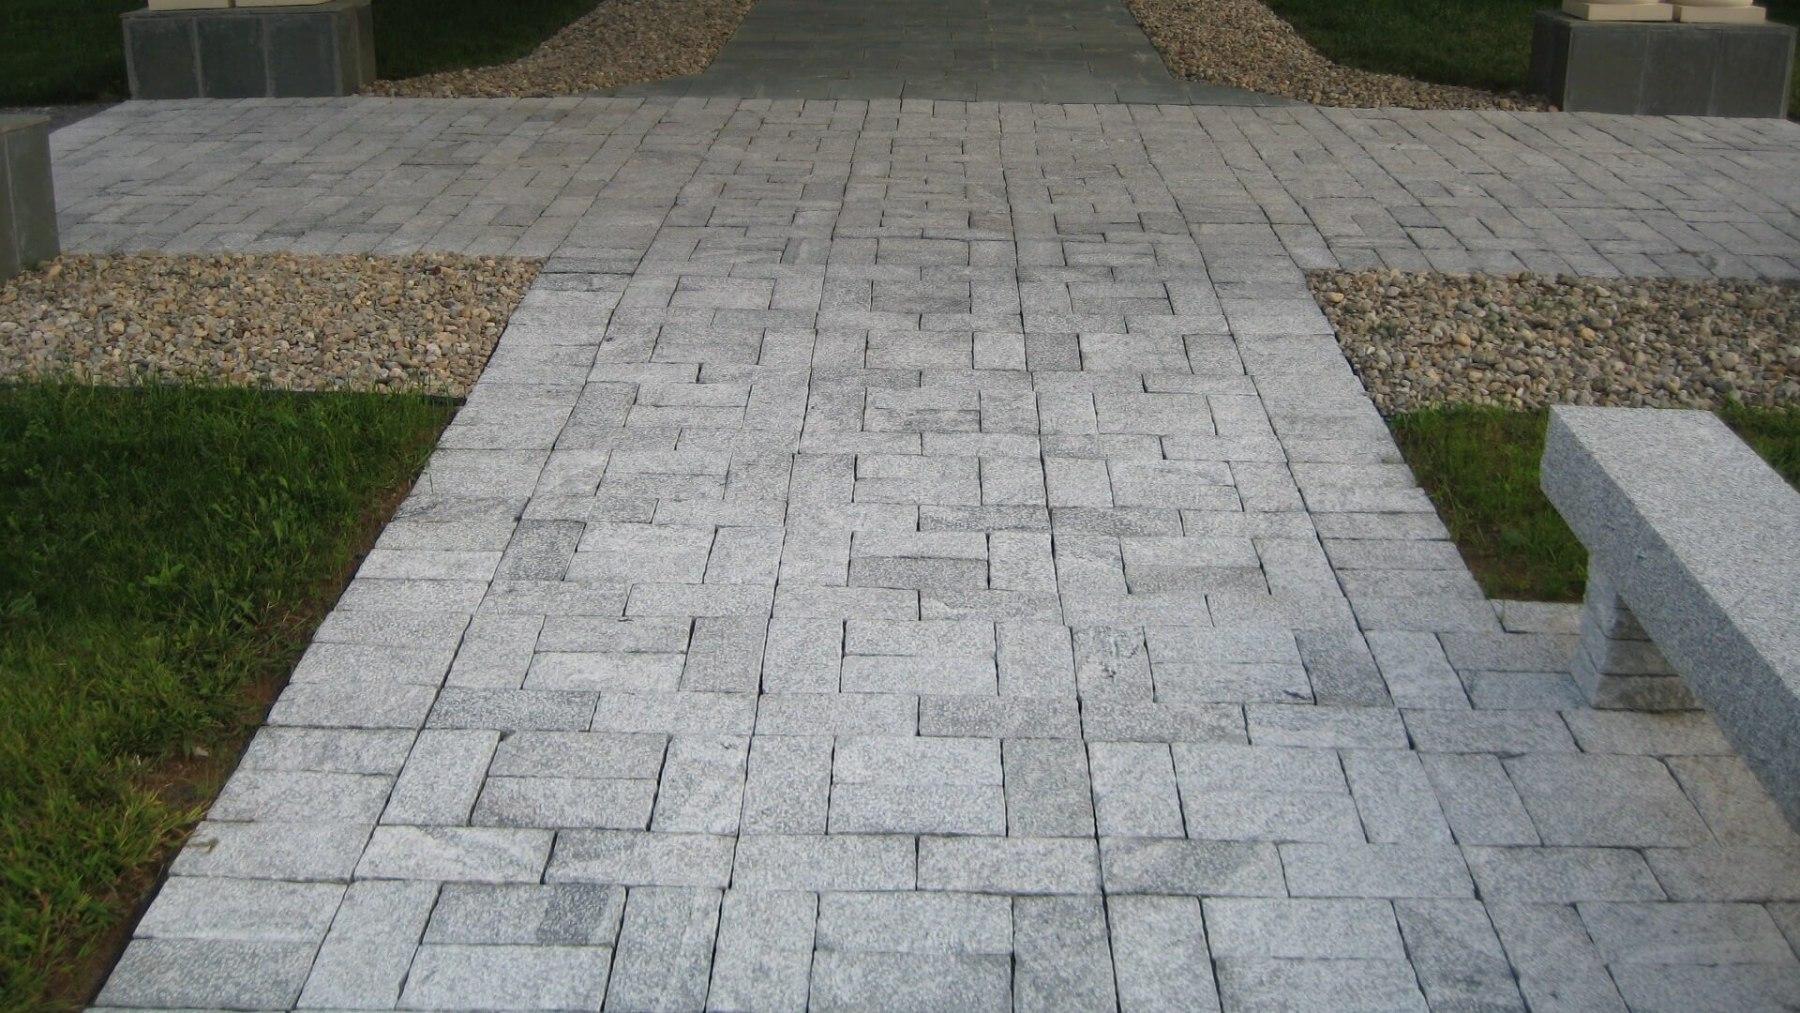 "GRAY Granite Bush Hammered Paver 6x12x3""+/-"